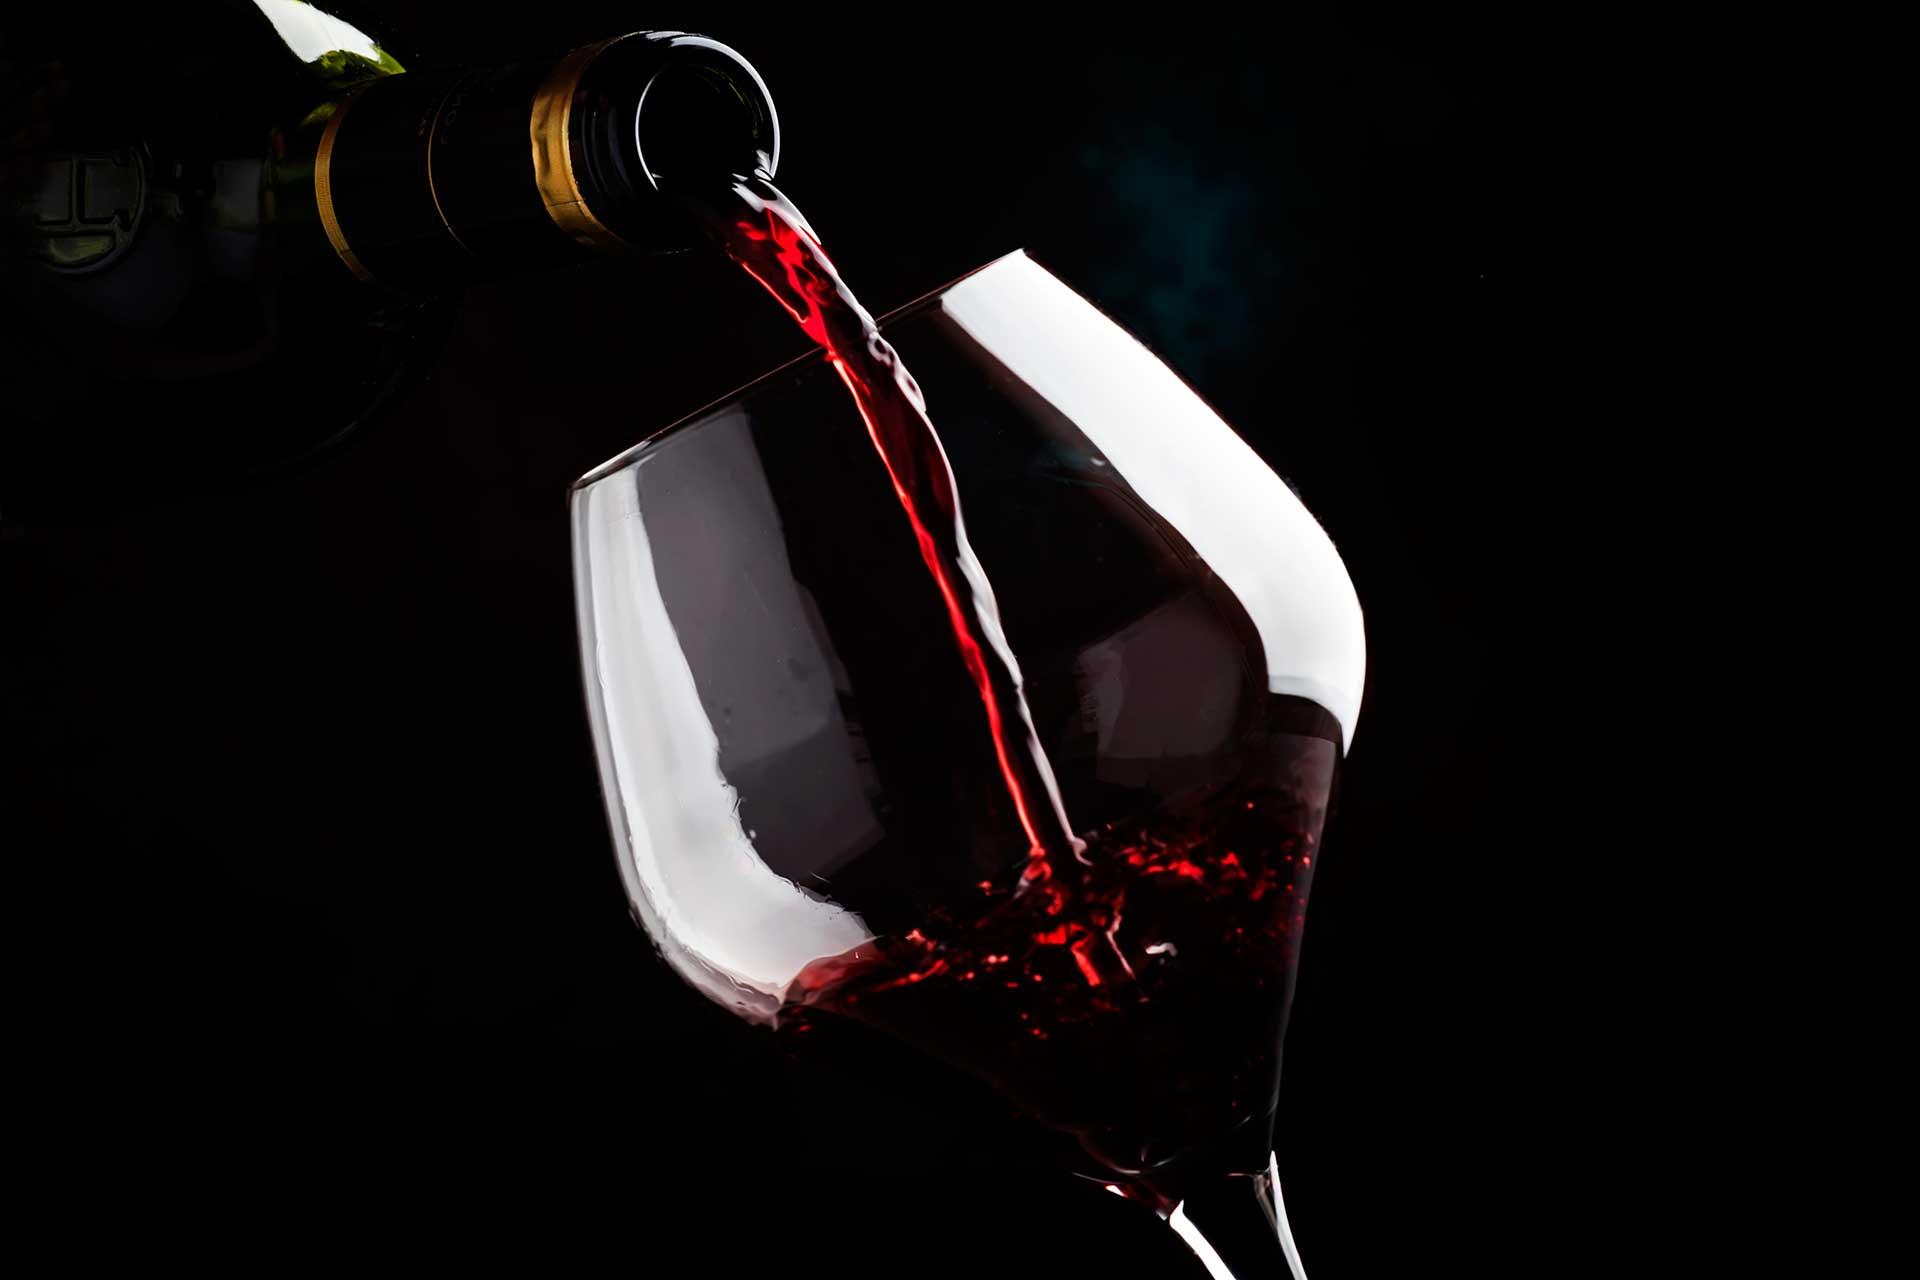 vinos recomendados - Eneko sukaldari